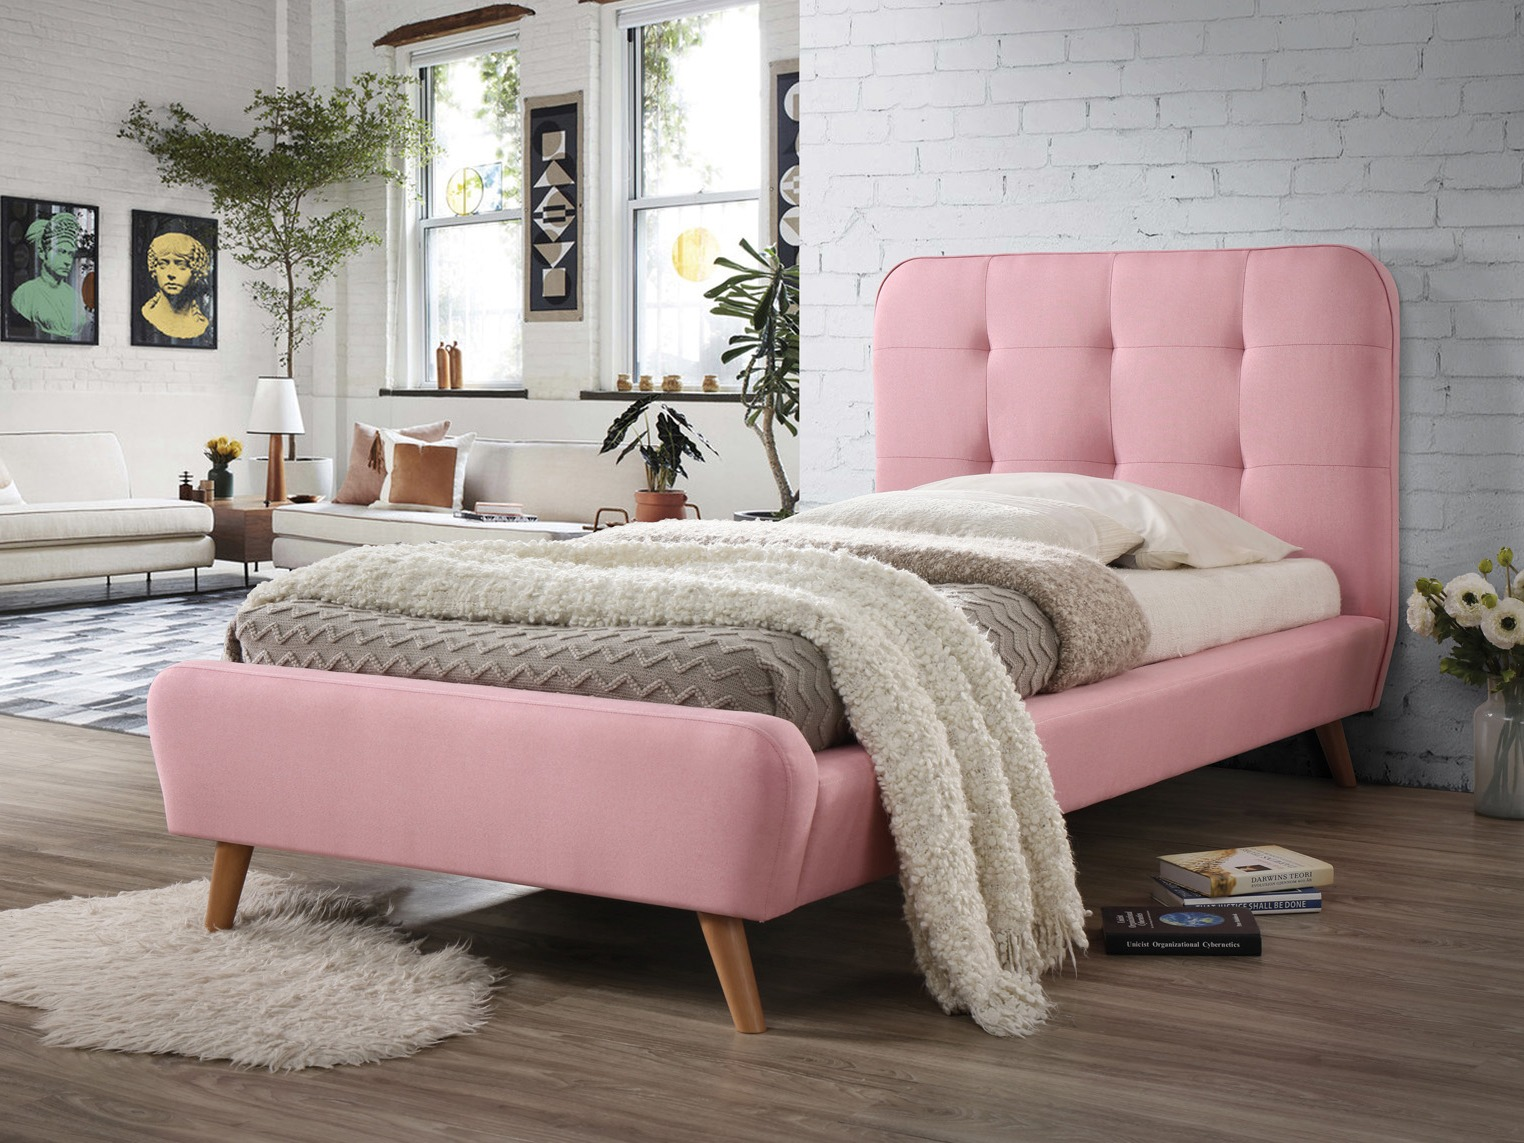 Dormitor in culori pastel